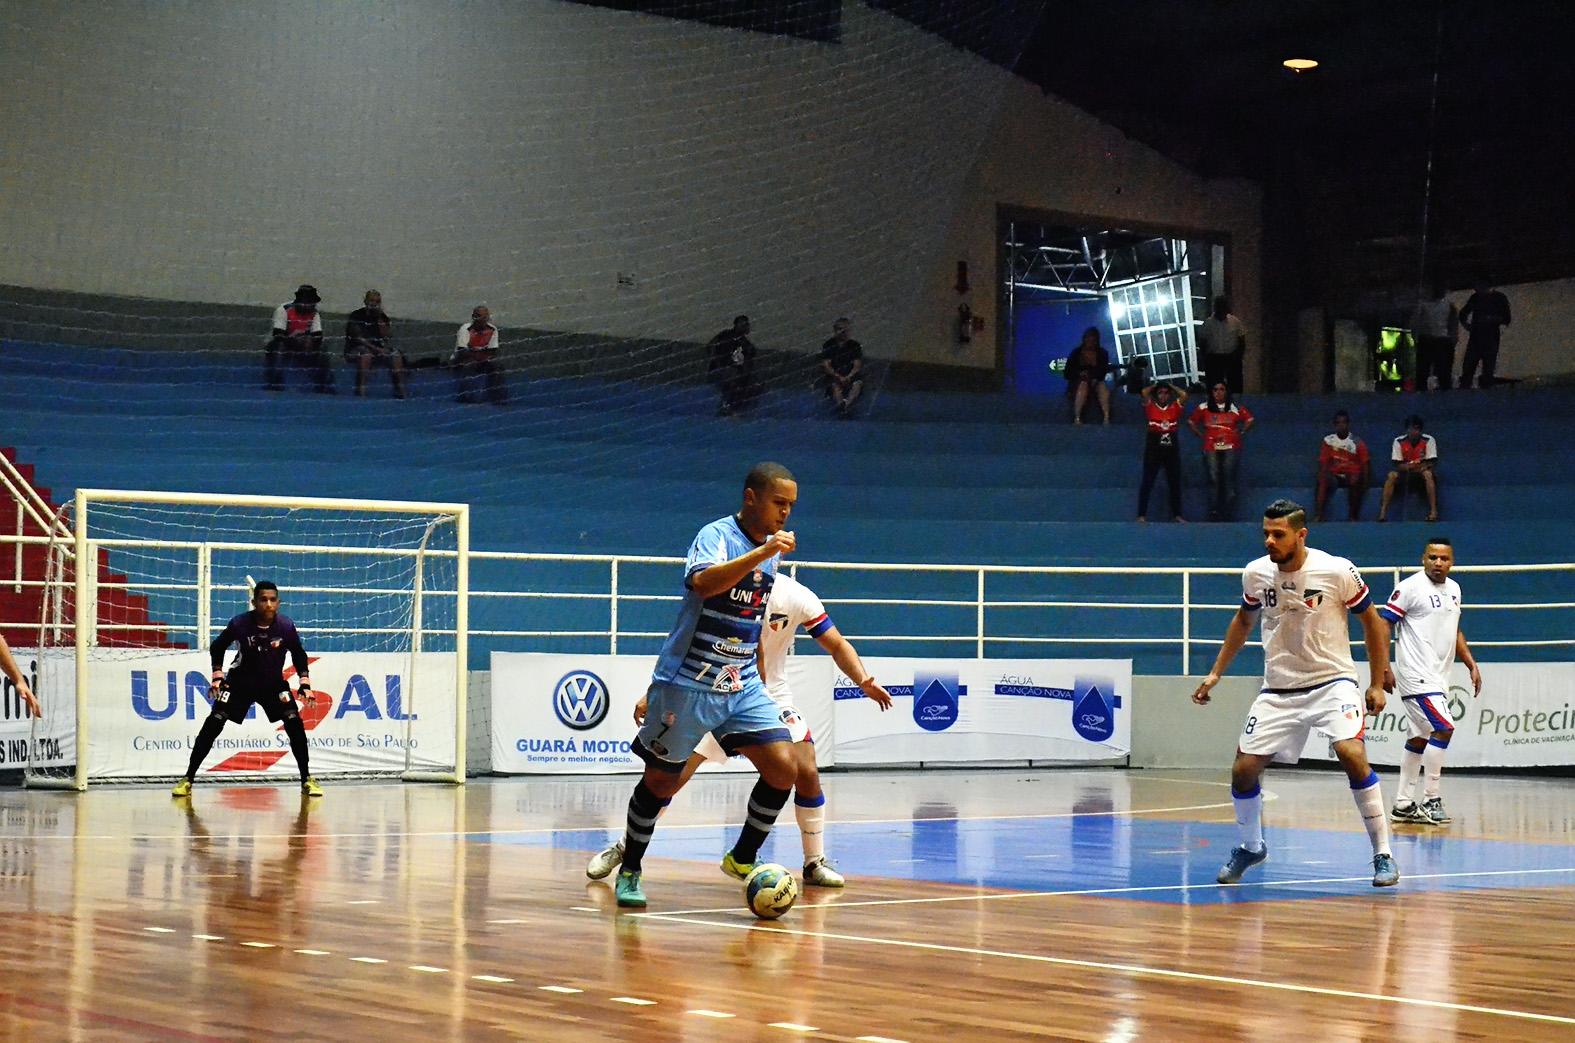 Caio tenta sair jogando durante partida de estreia do Yoka na Copa (Foto: Leandro Oliveira)